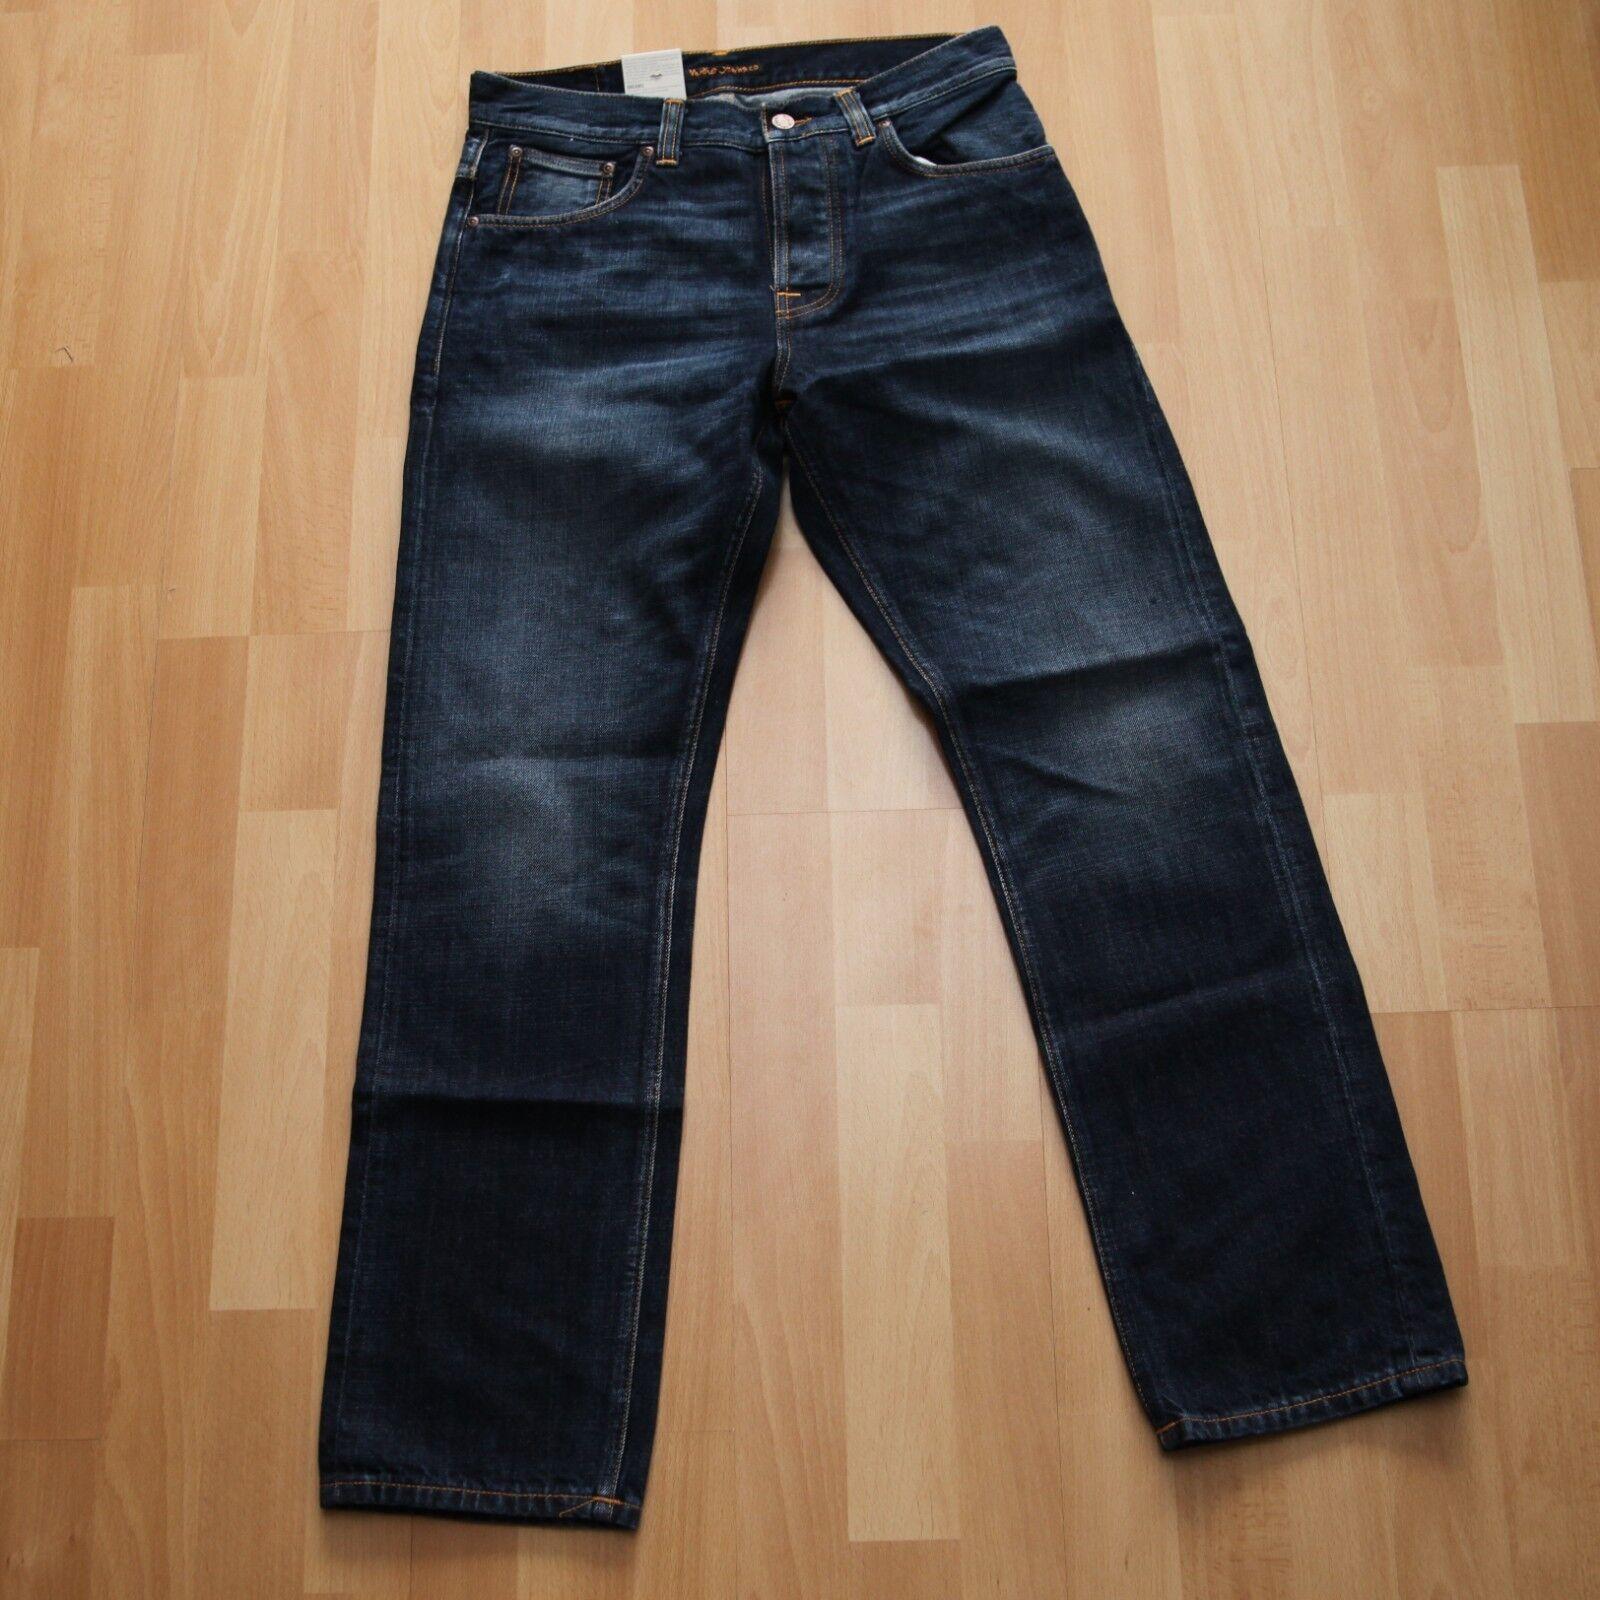 NEU Nudie Jeans SLEEPY SIXTEN (Relaxed straight fit) Authentic Dark 30 30